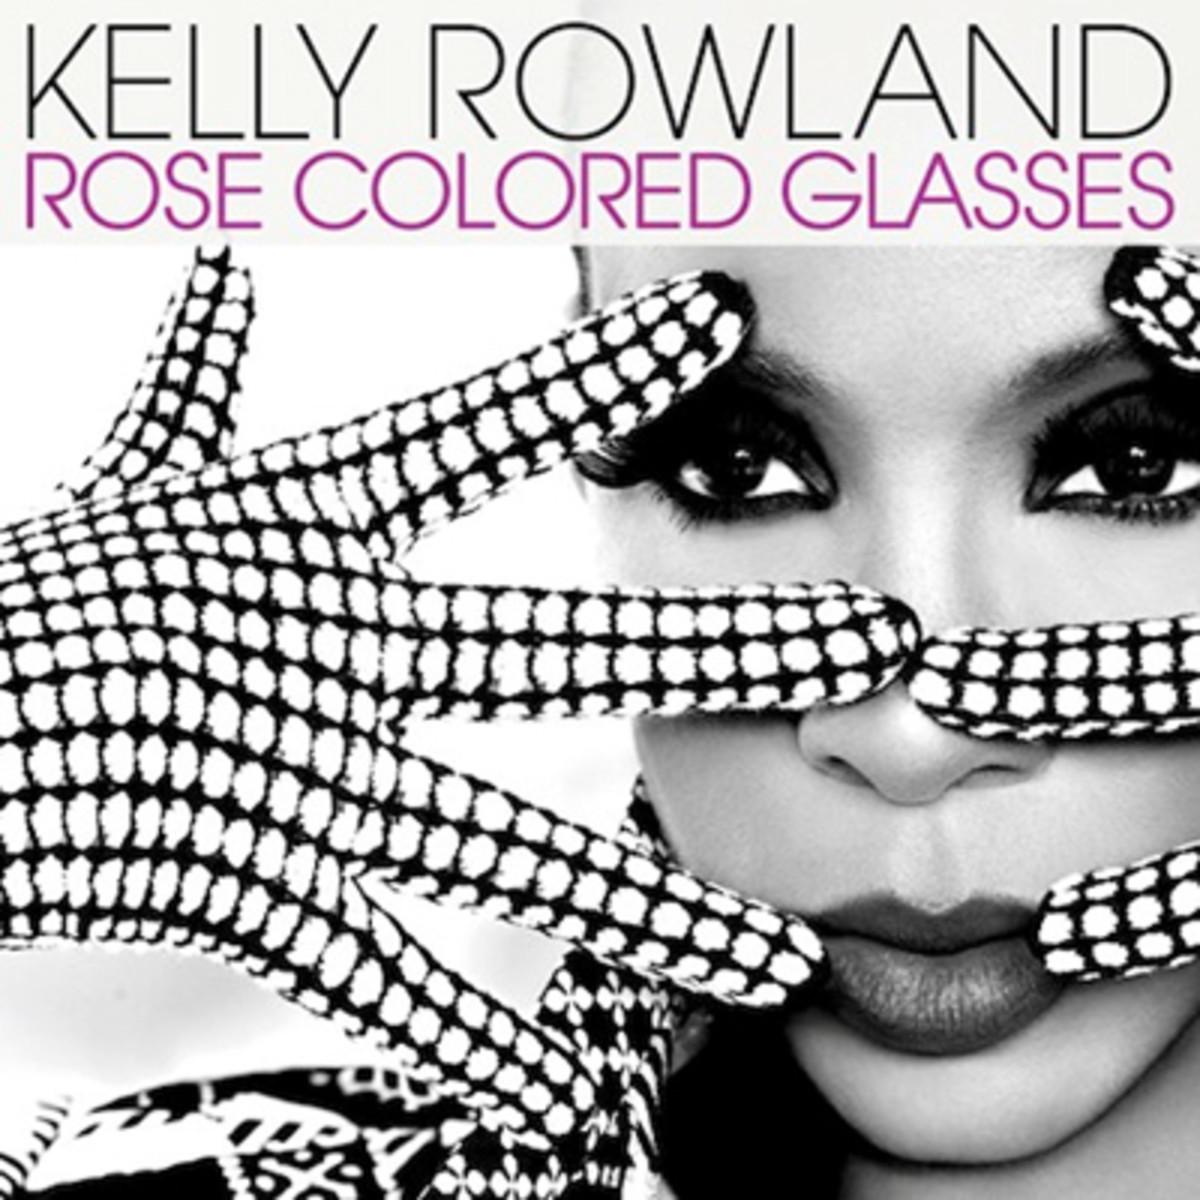 kellyrowland-rosecoloredglasses.jpg